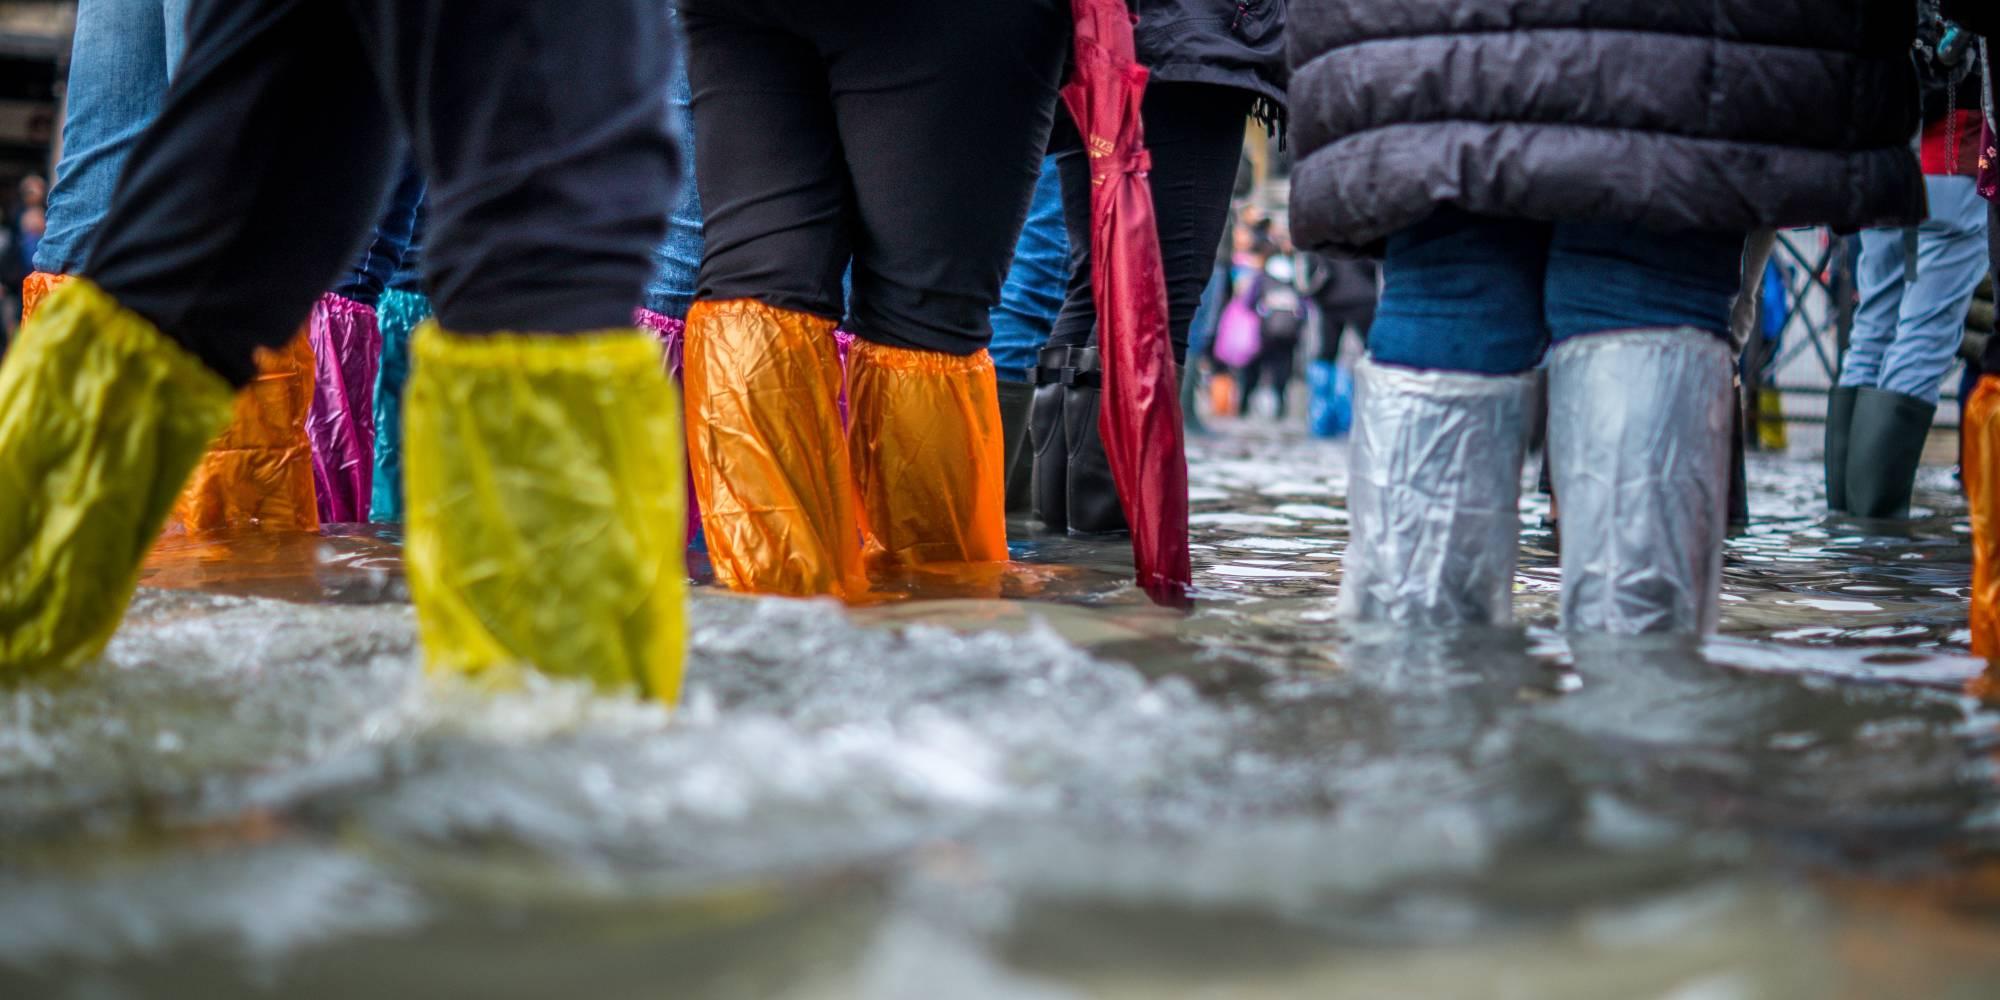 inundaciones   Business Insider Mexico